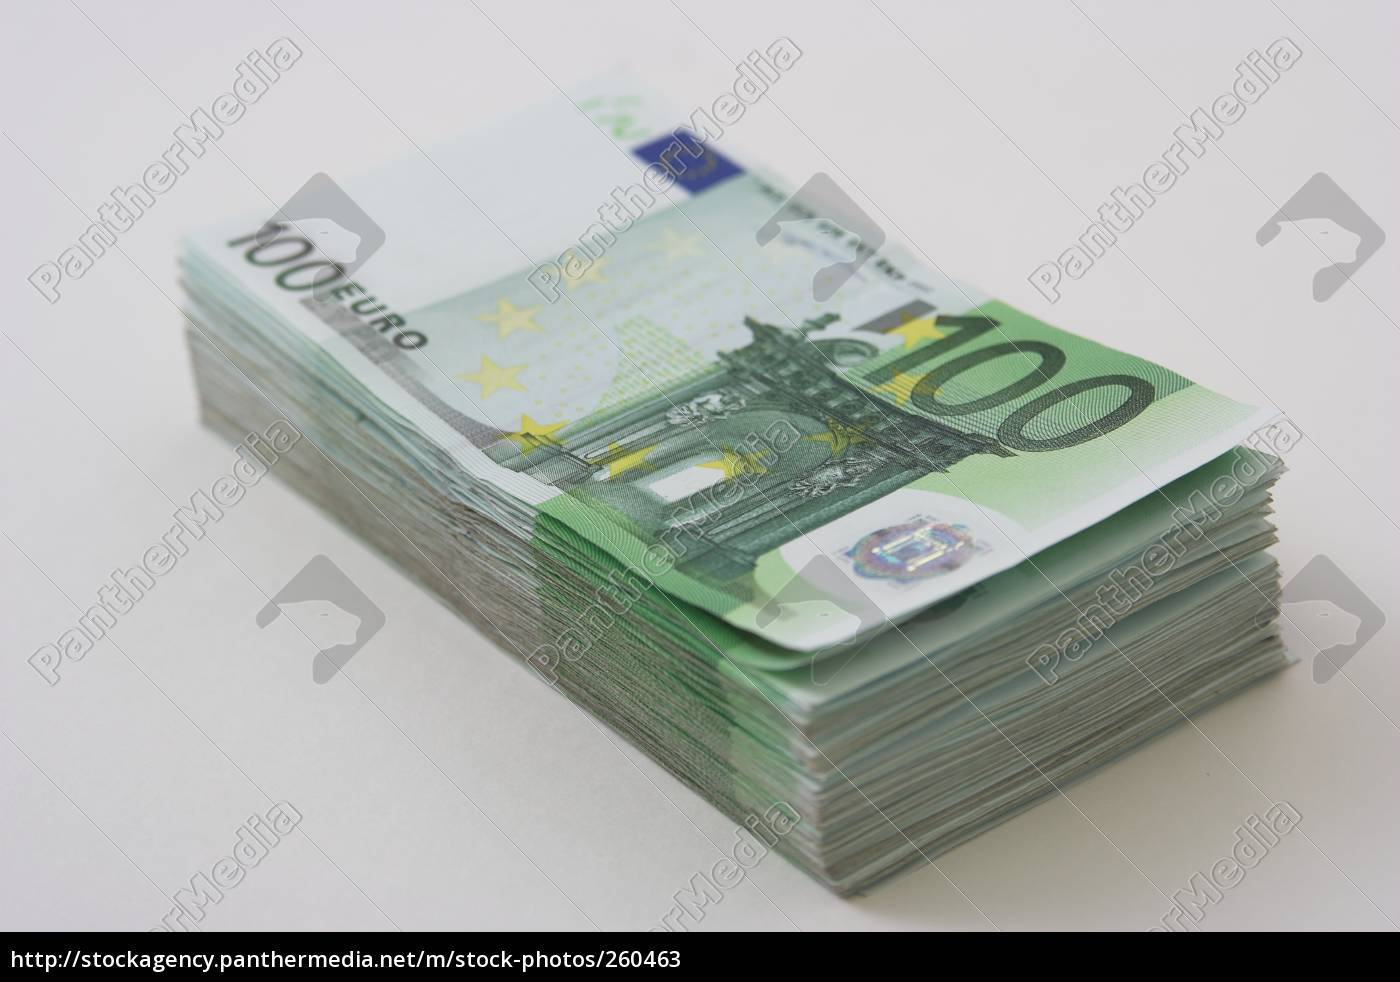 banknotes, open, 100, (€, 10, 000),ver.4 - 260463